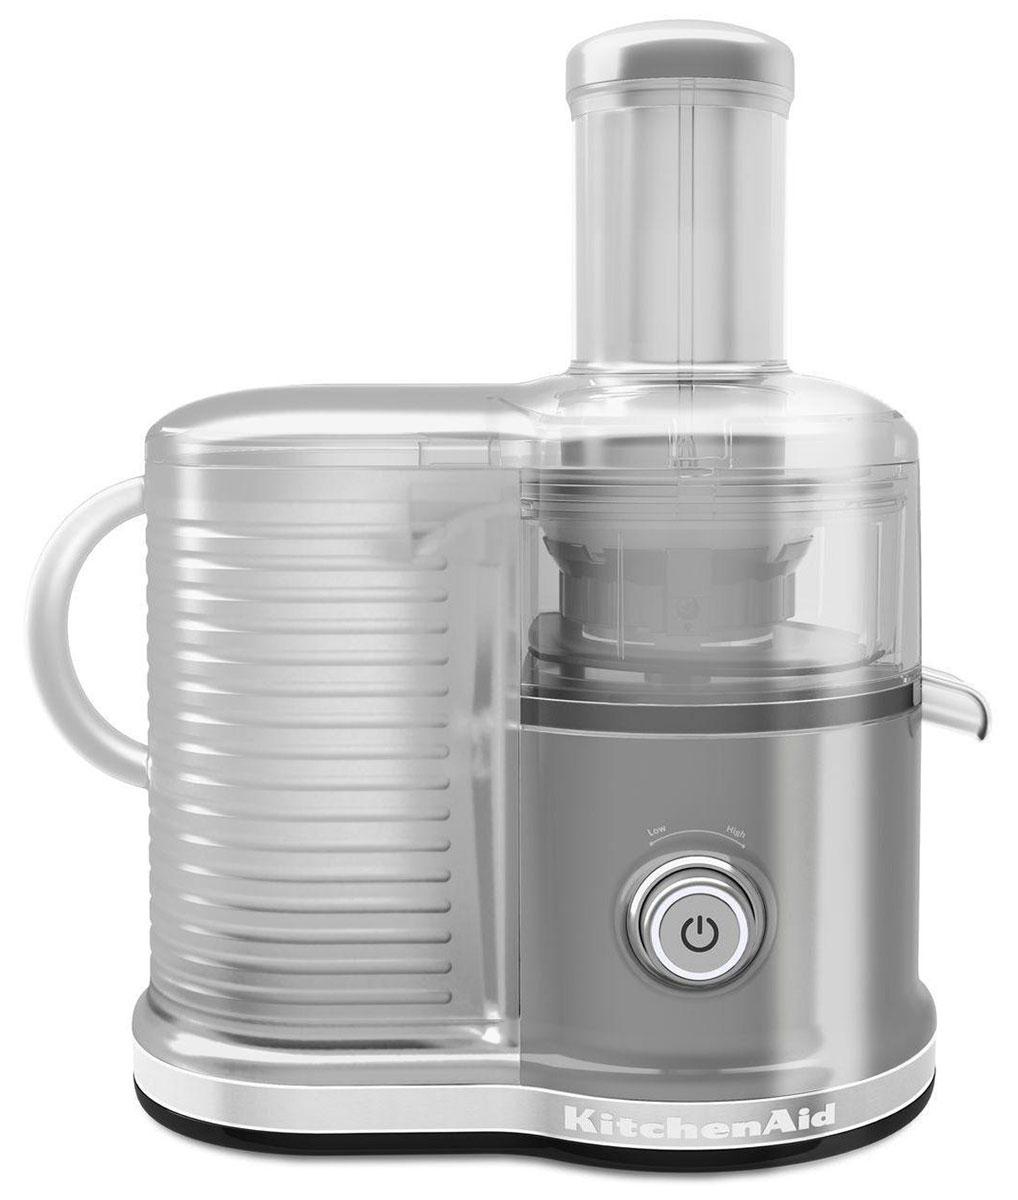 KitchenAid Artisan 5KVJ0333, Silver соковыжималка 5KVJ0333EMS